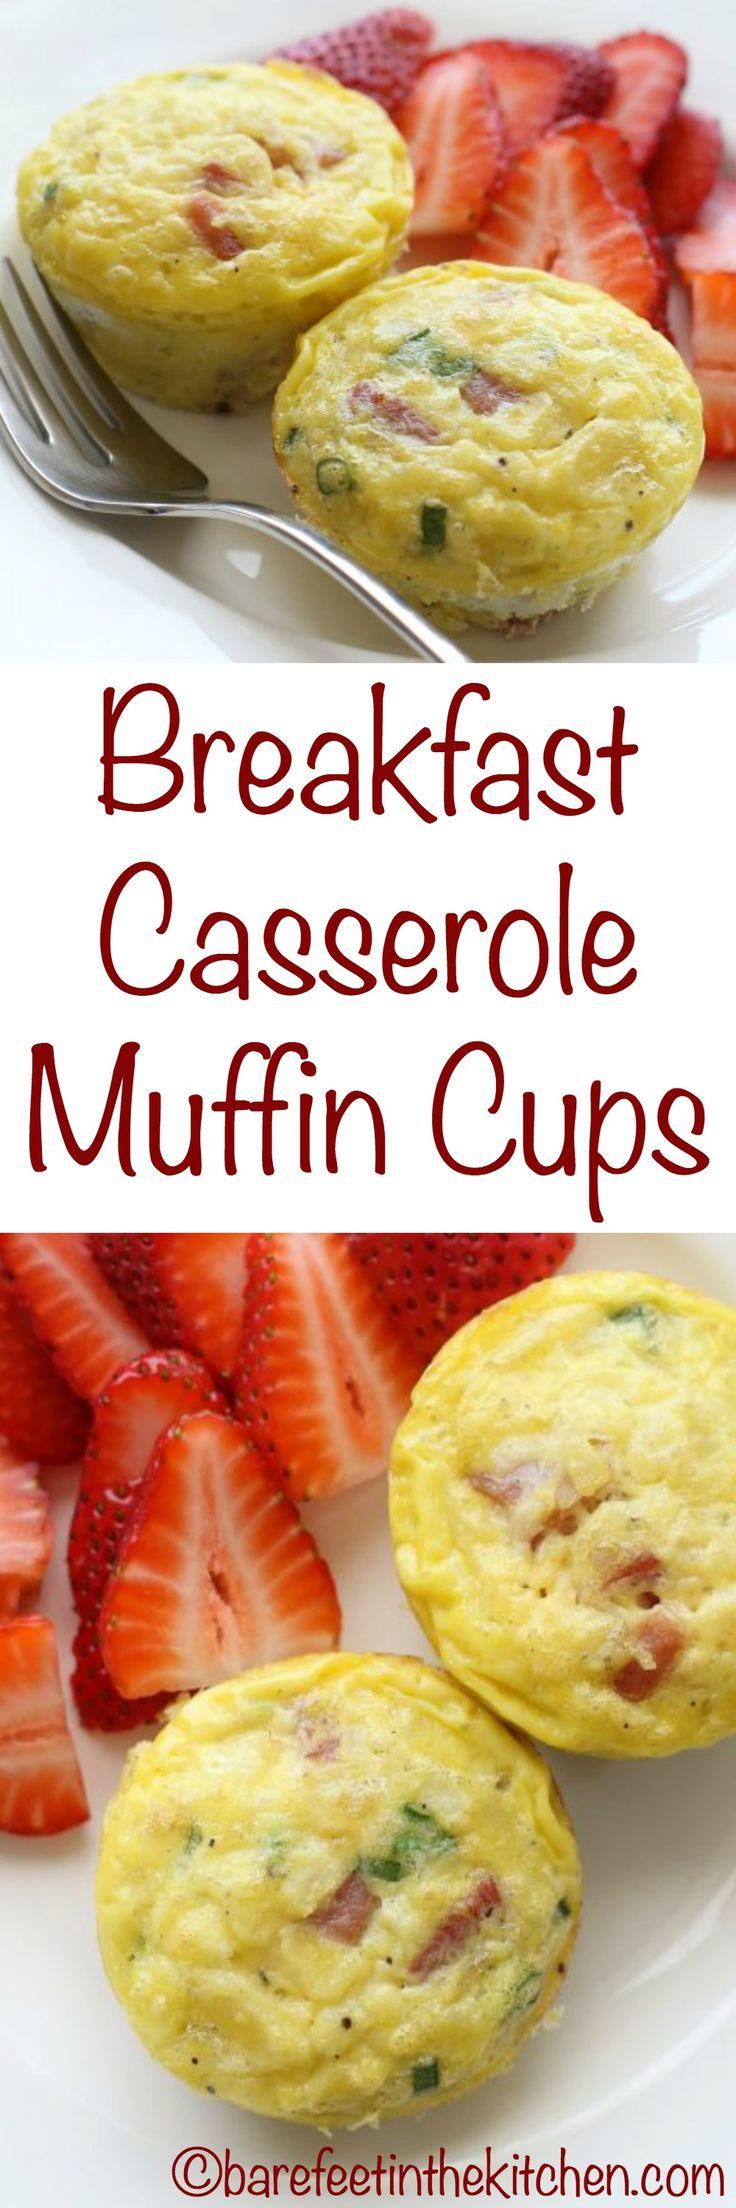 Breakfast Casserole Muffin Cups - get the recipe at barefeetinthekitchen.com